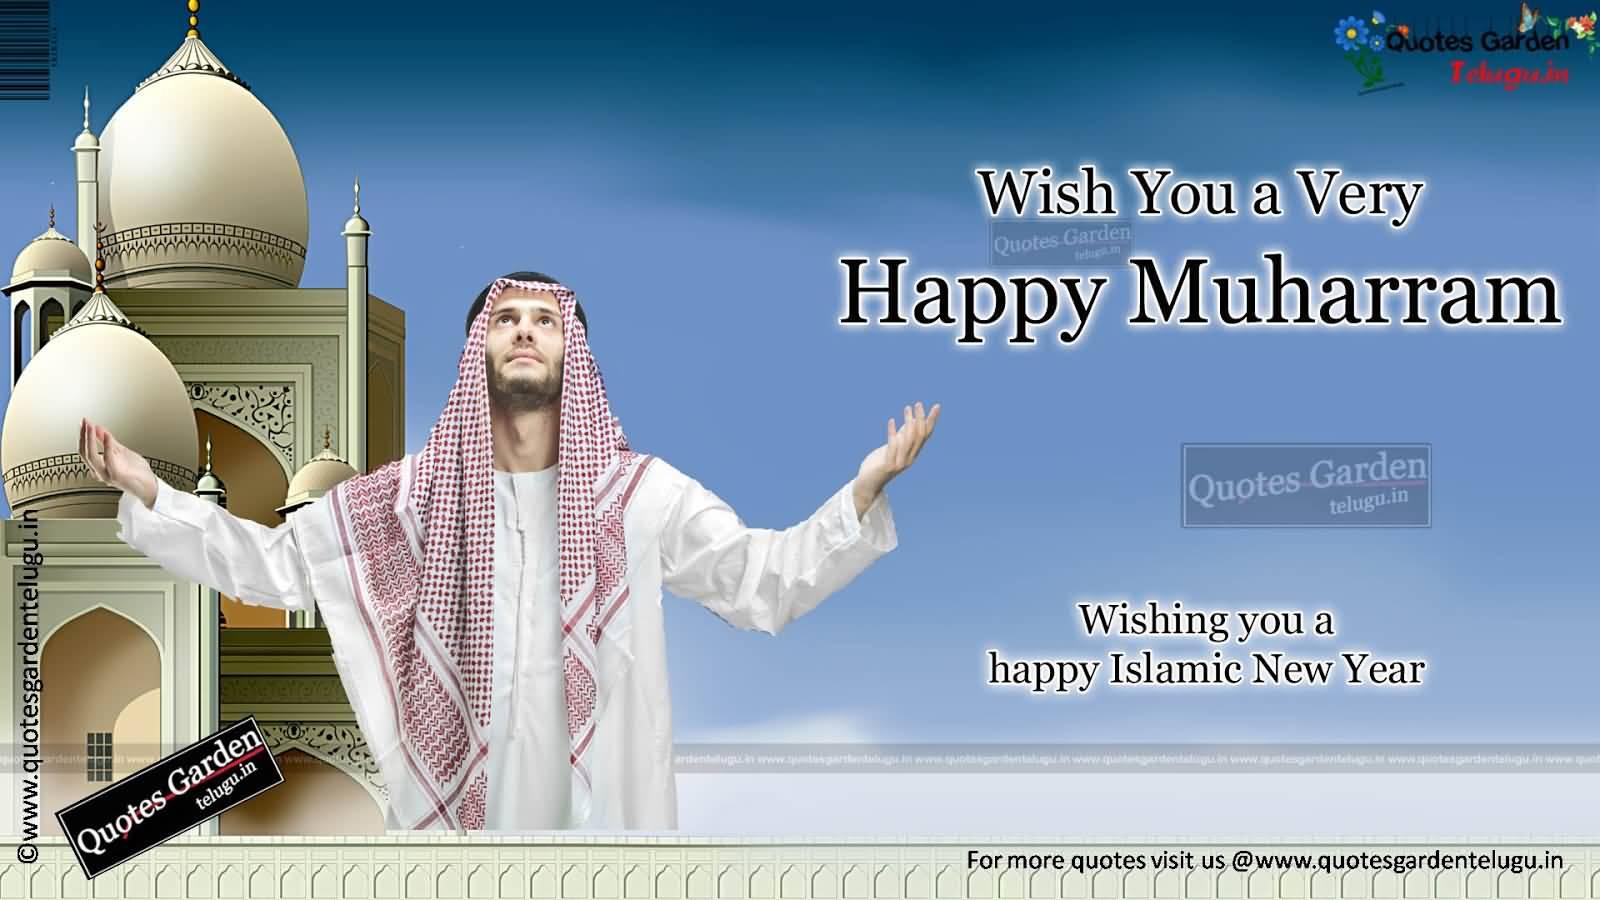 Happy Muharram 2019 Hd Wallpaper For Desktop